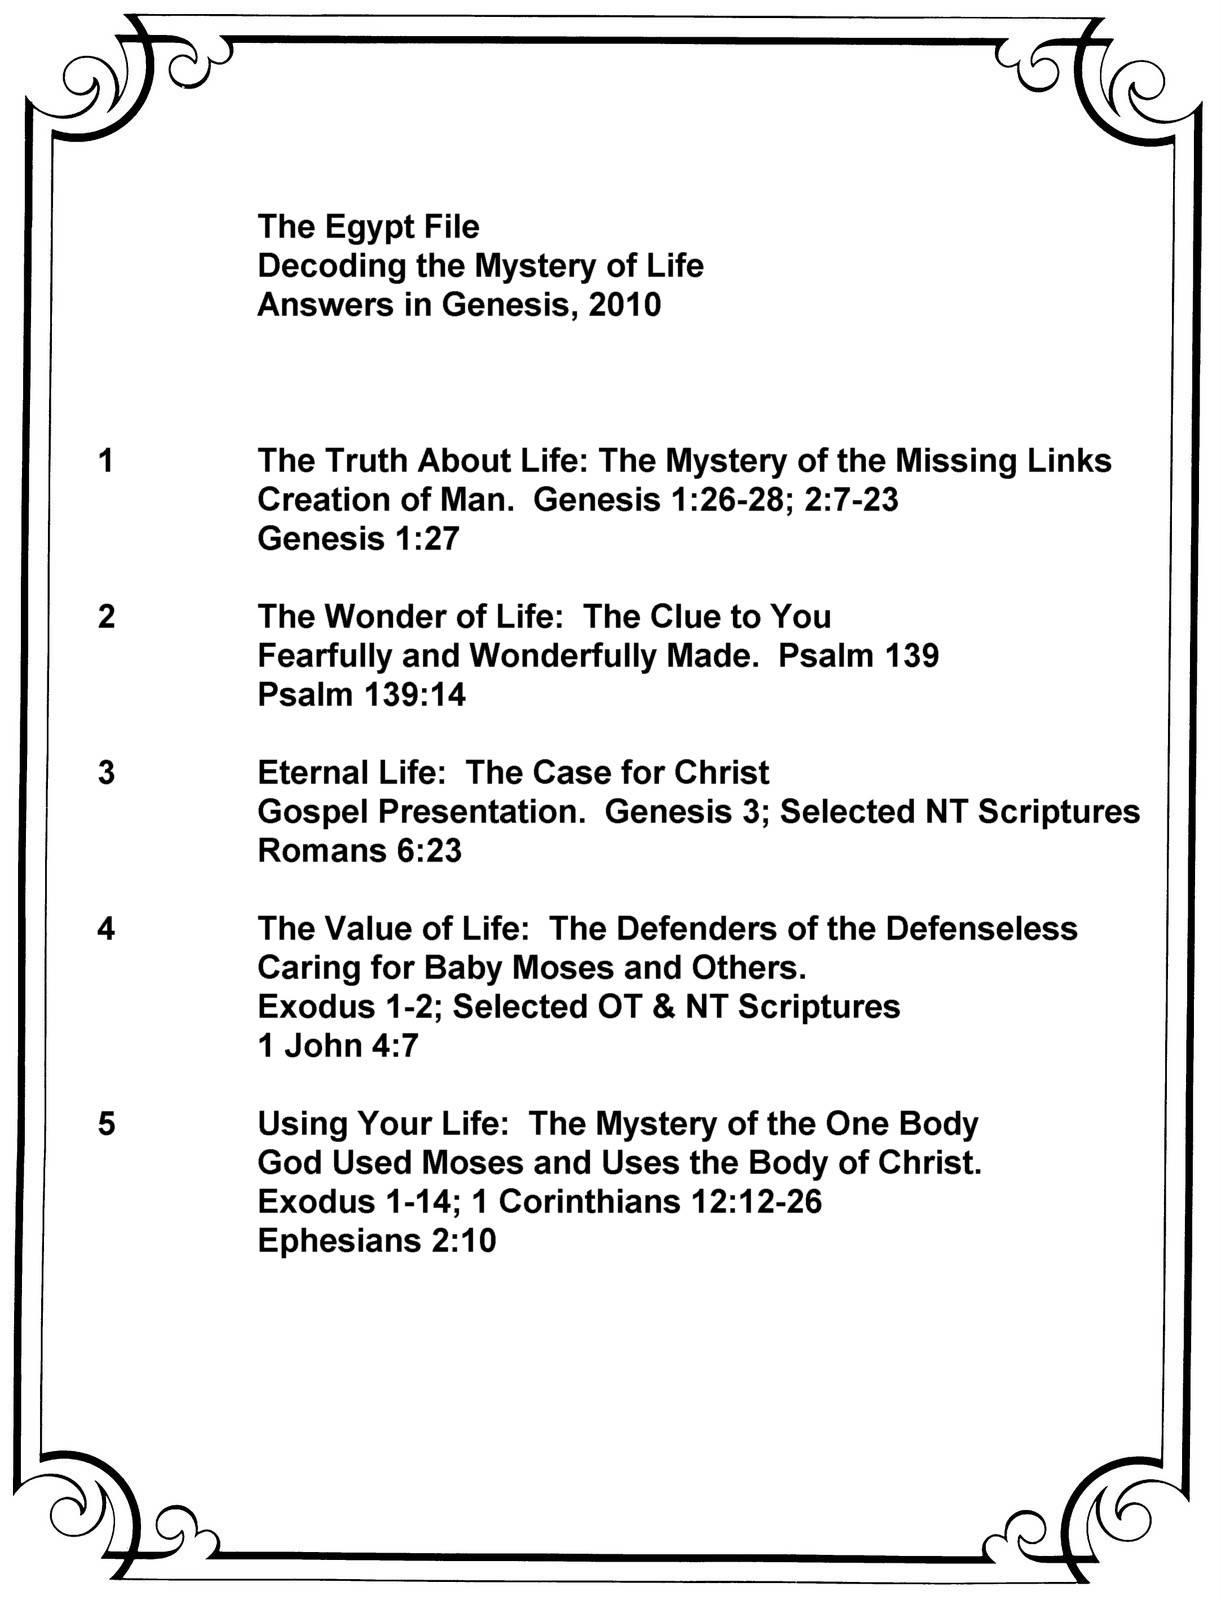 The Egypt File Summary